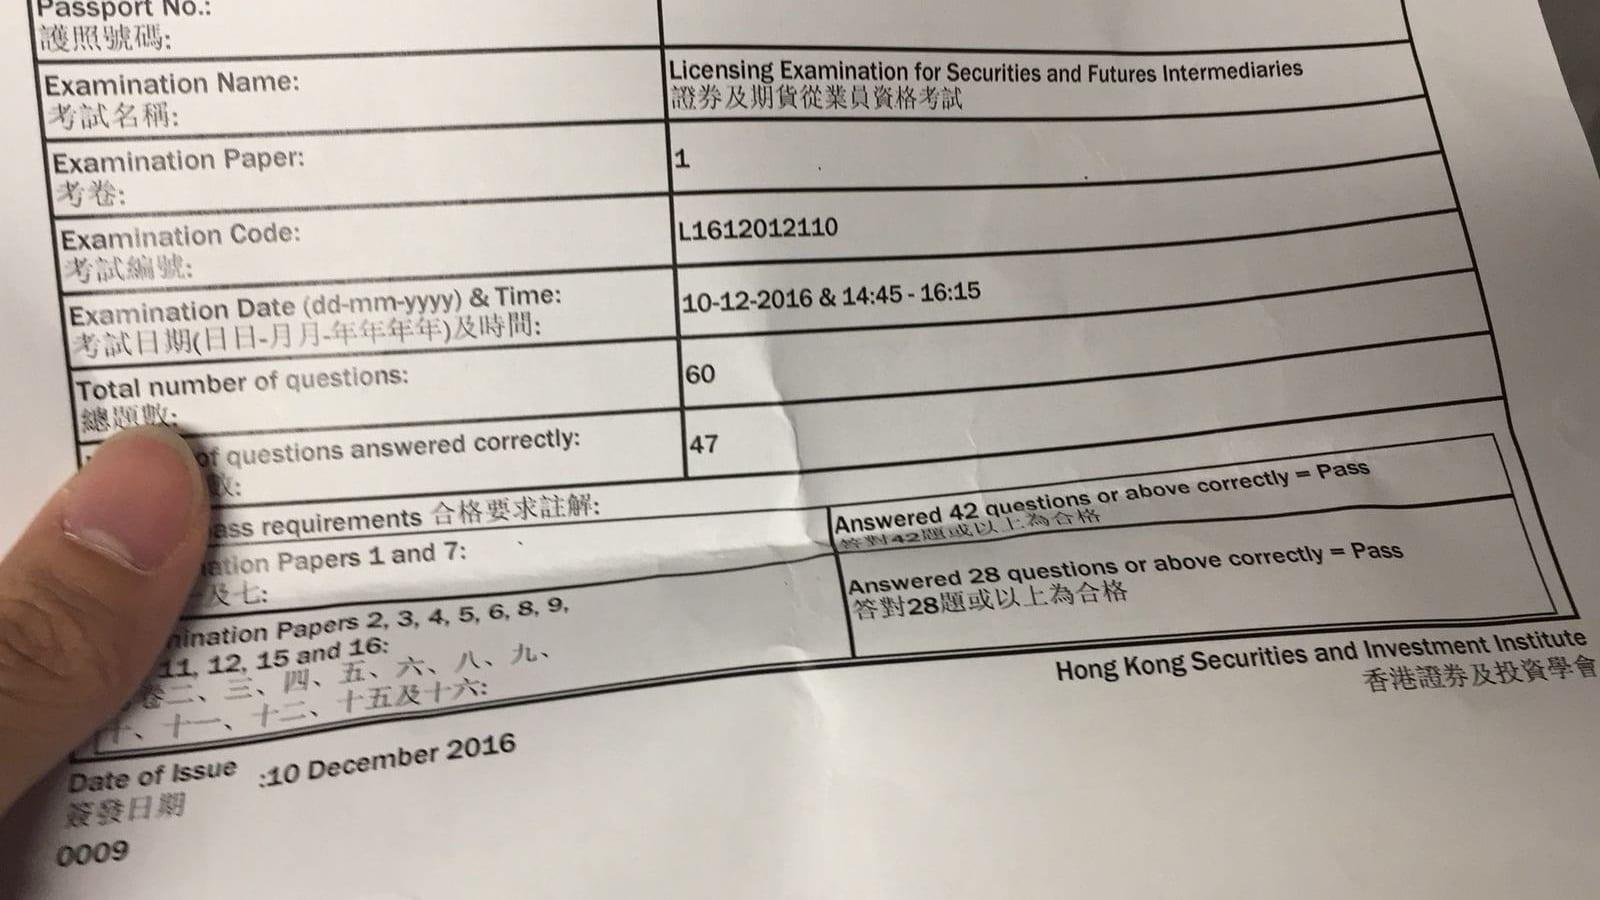 LCK 10/12/2016 LE Paper 1 證券期貨從業員資格考試卷一 Pass